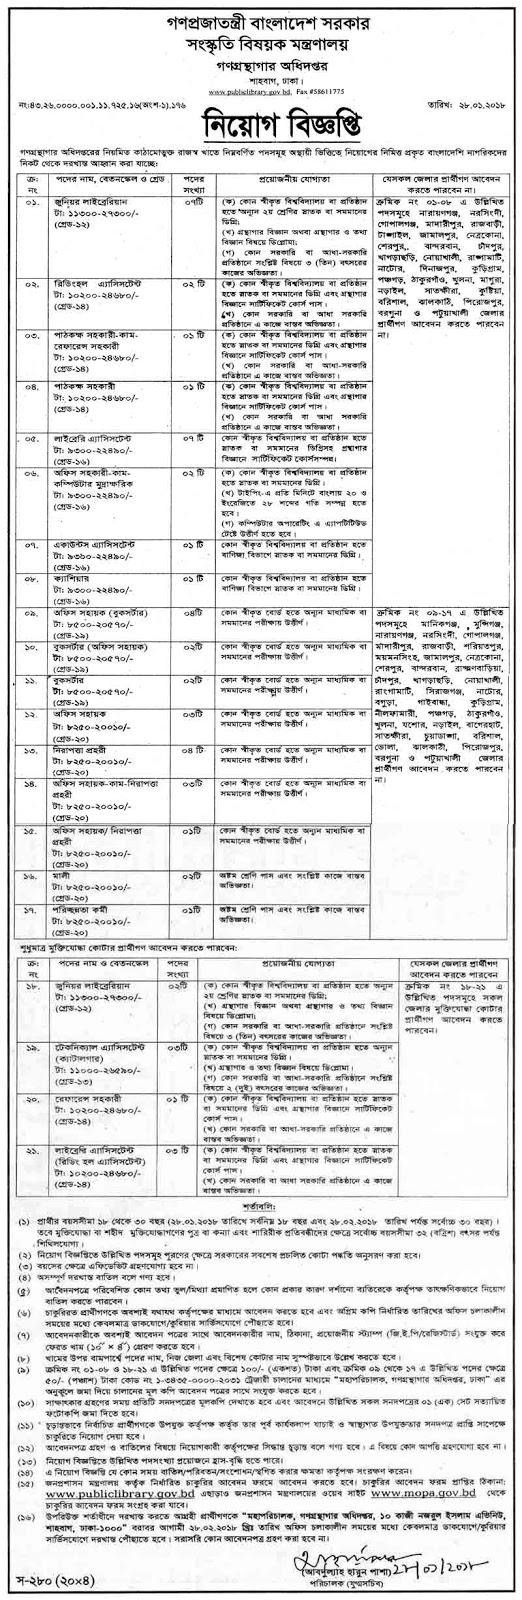 Bangladesh Public Library Department Job Circular 2018 2